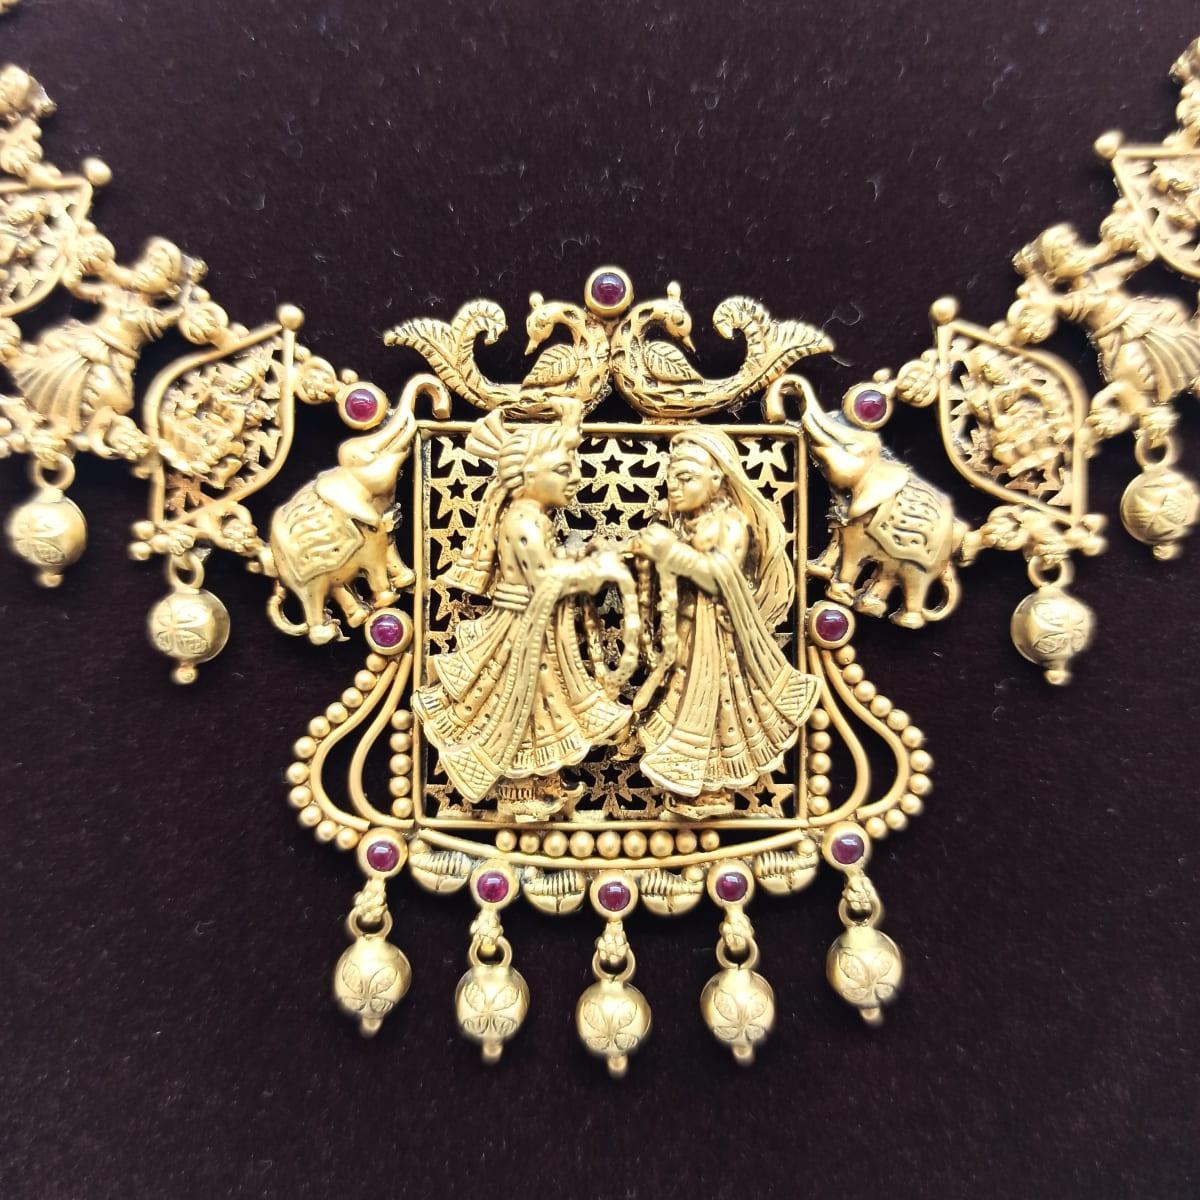 Antique Bride And Groom Necklace